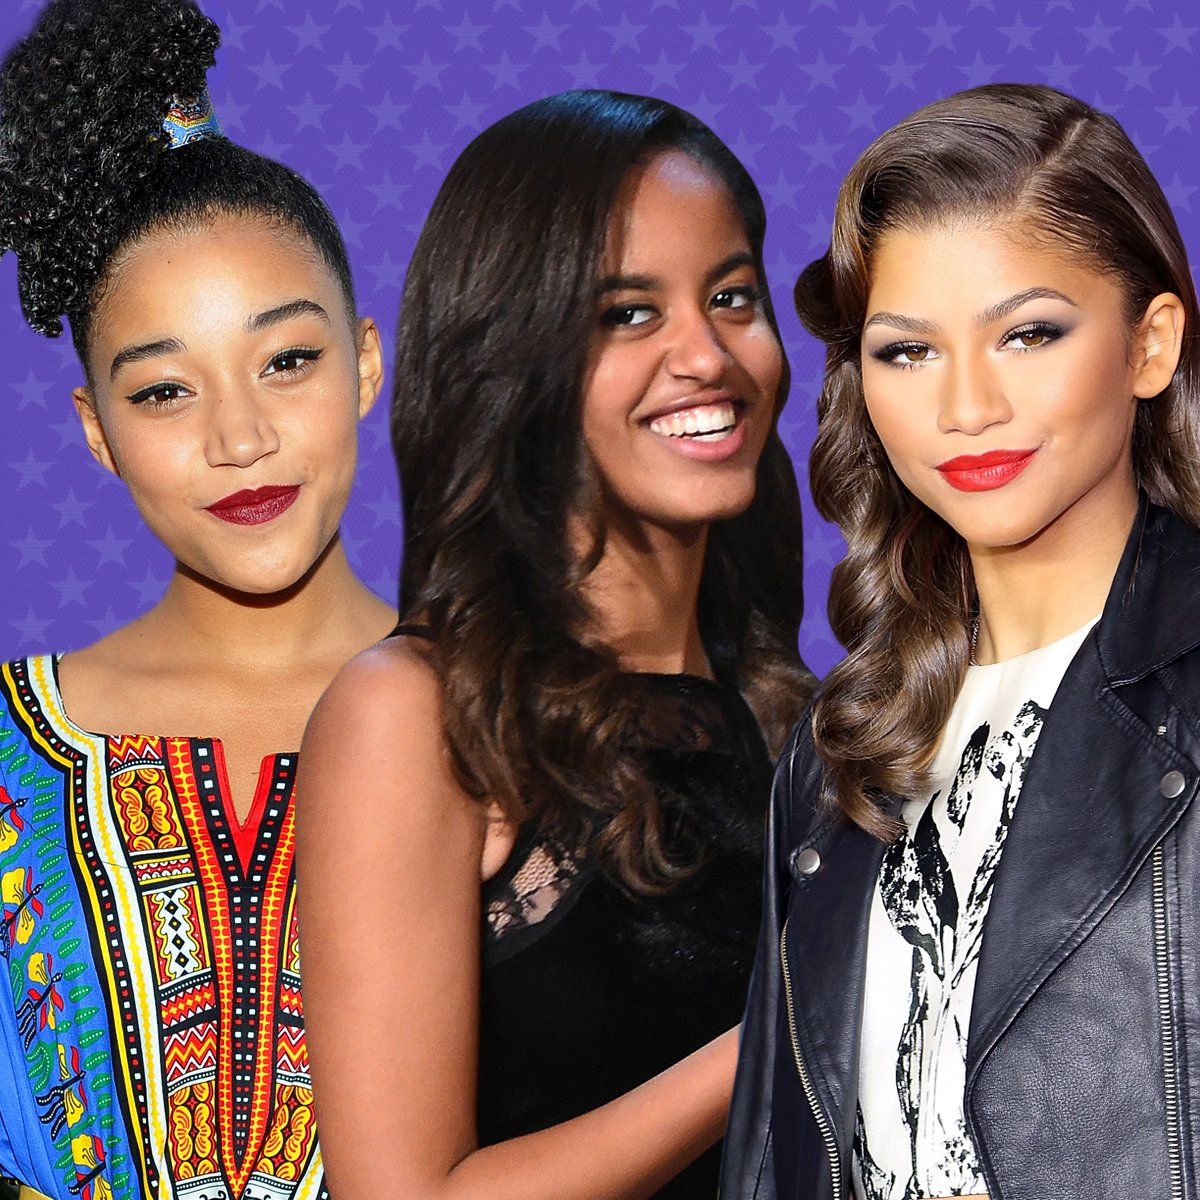 Congrats! Zendaya, Malia Obama & Amandla Stenberg make TIME's 'Most Influential Teens' list: https://t.co/iQoAoSsqYY